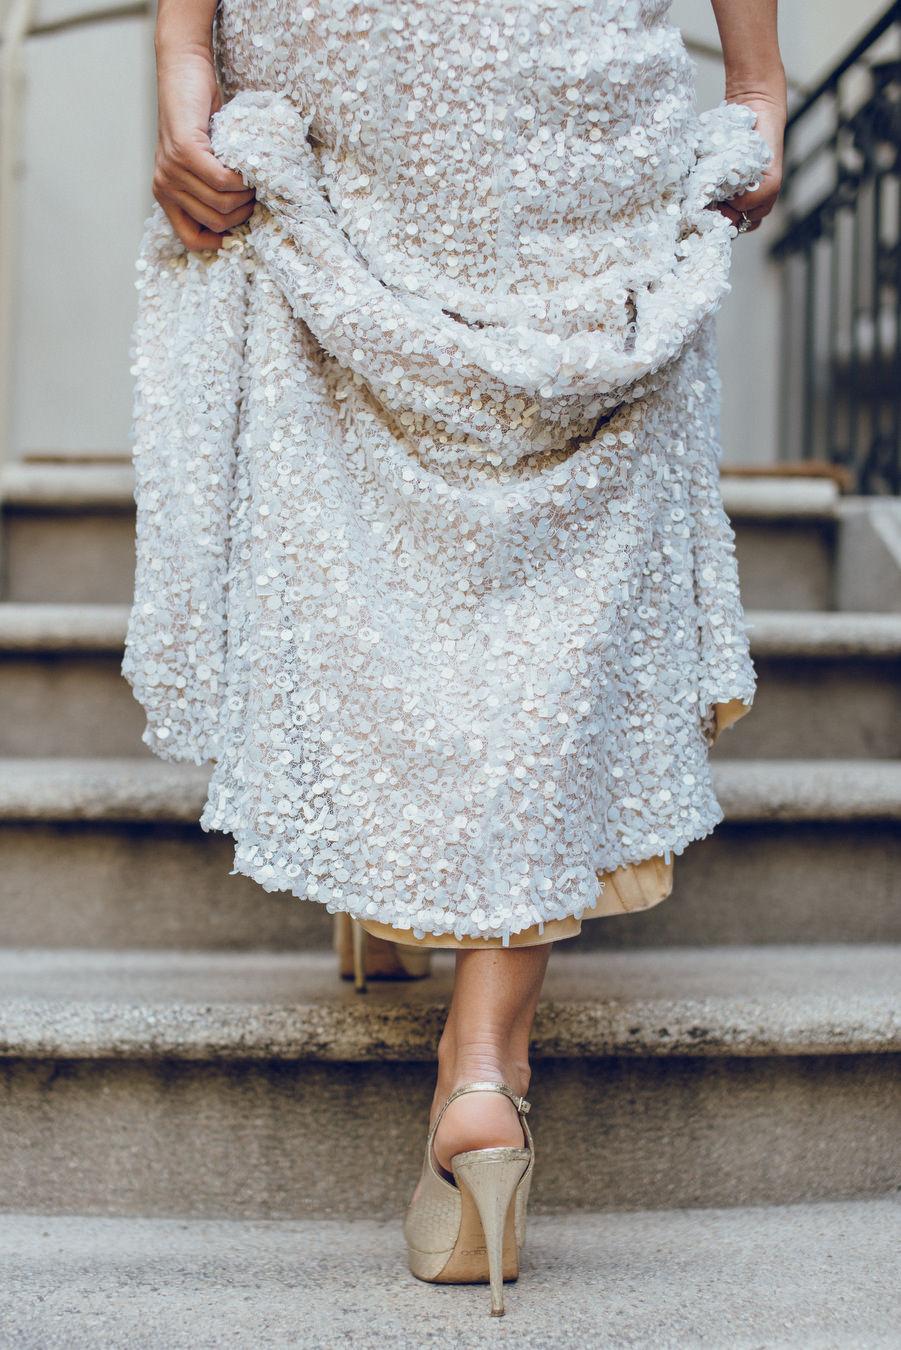 calista-one-lista-de-bodas-online-blog-de-bodas-bossanova-looks-invitadas-pepe-botella-5